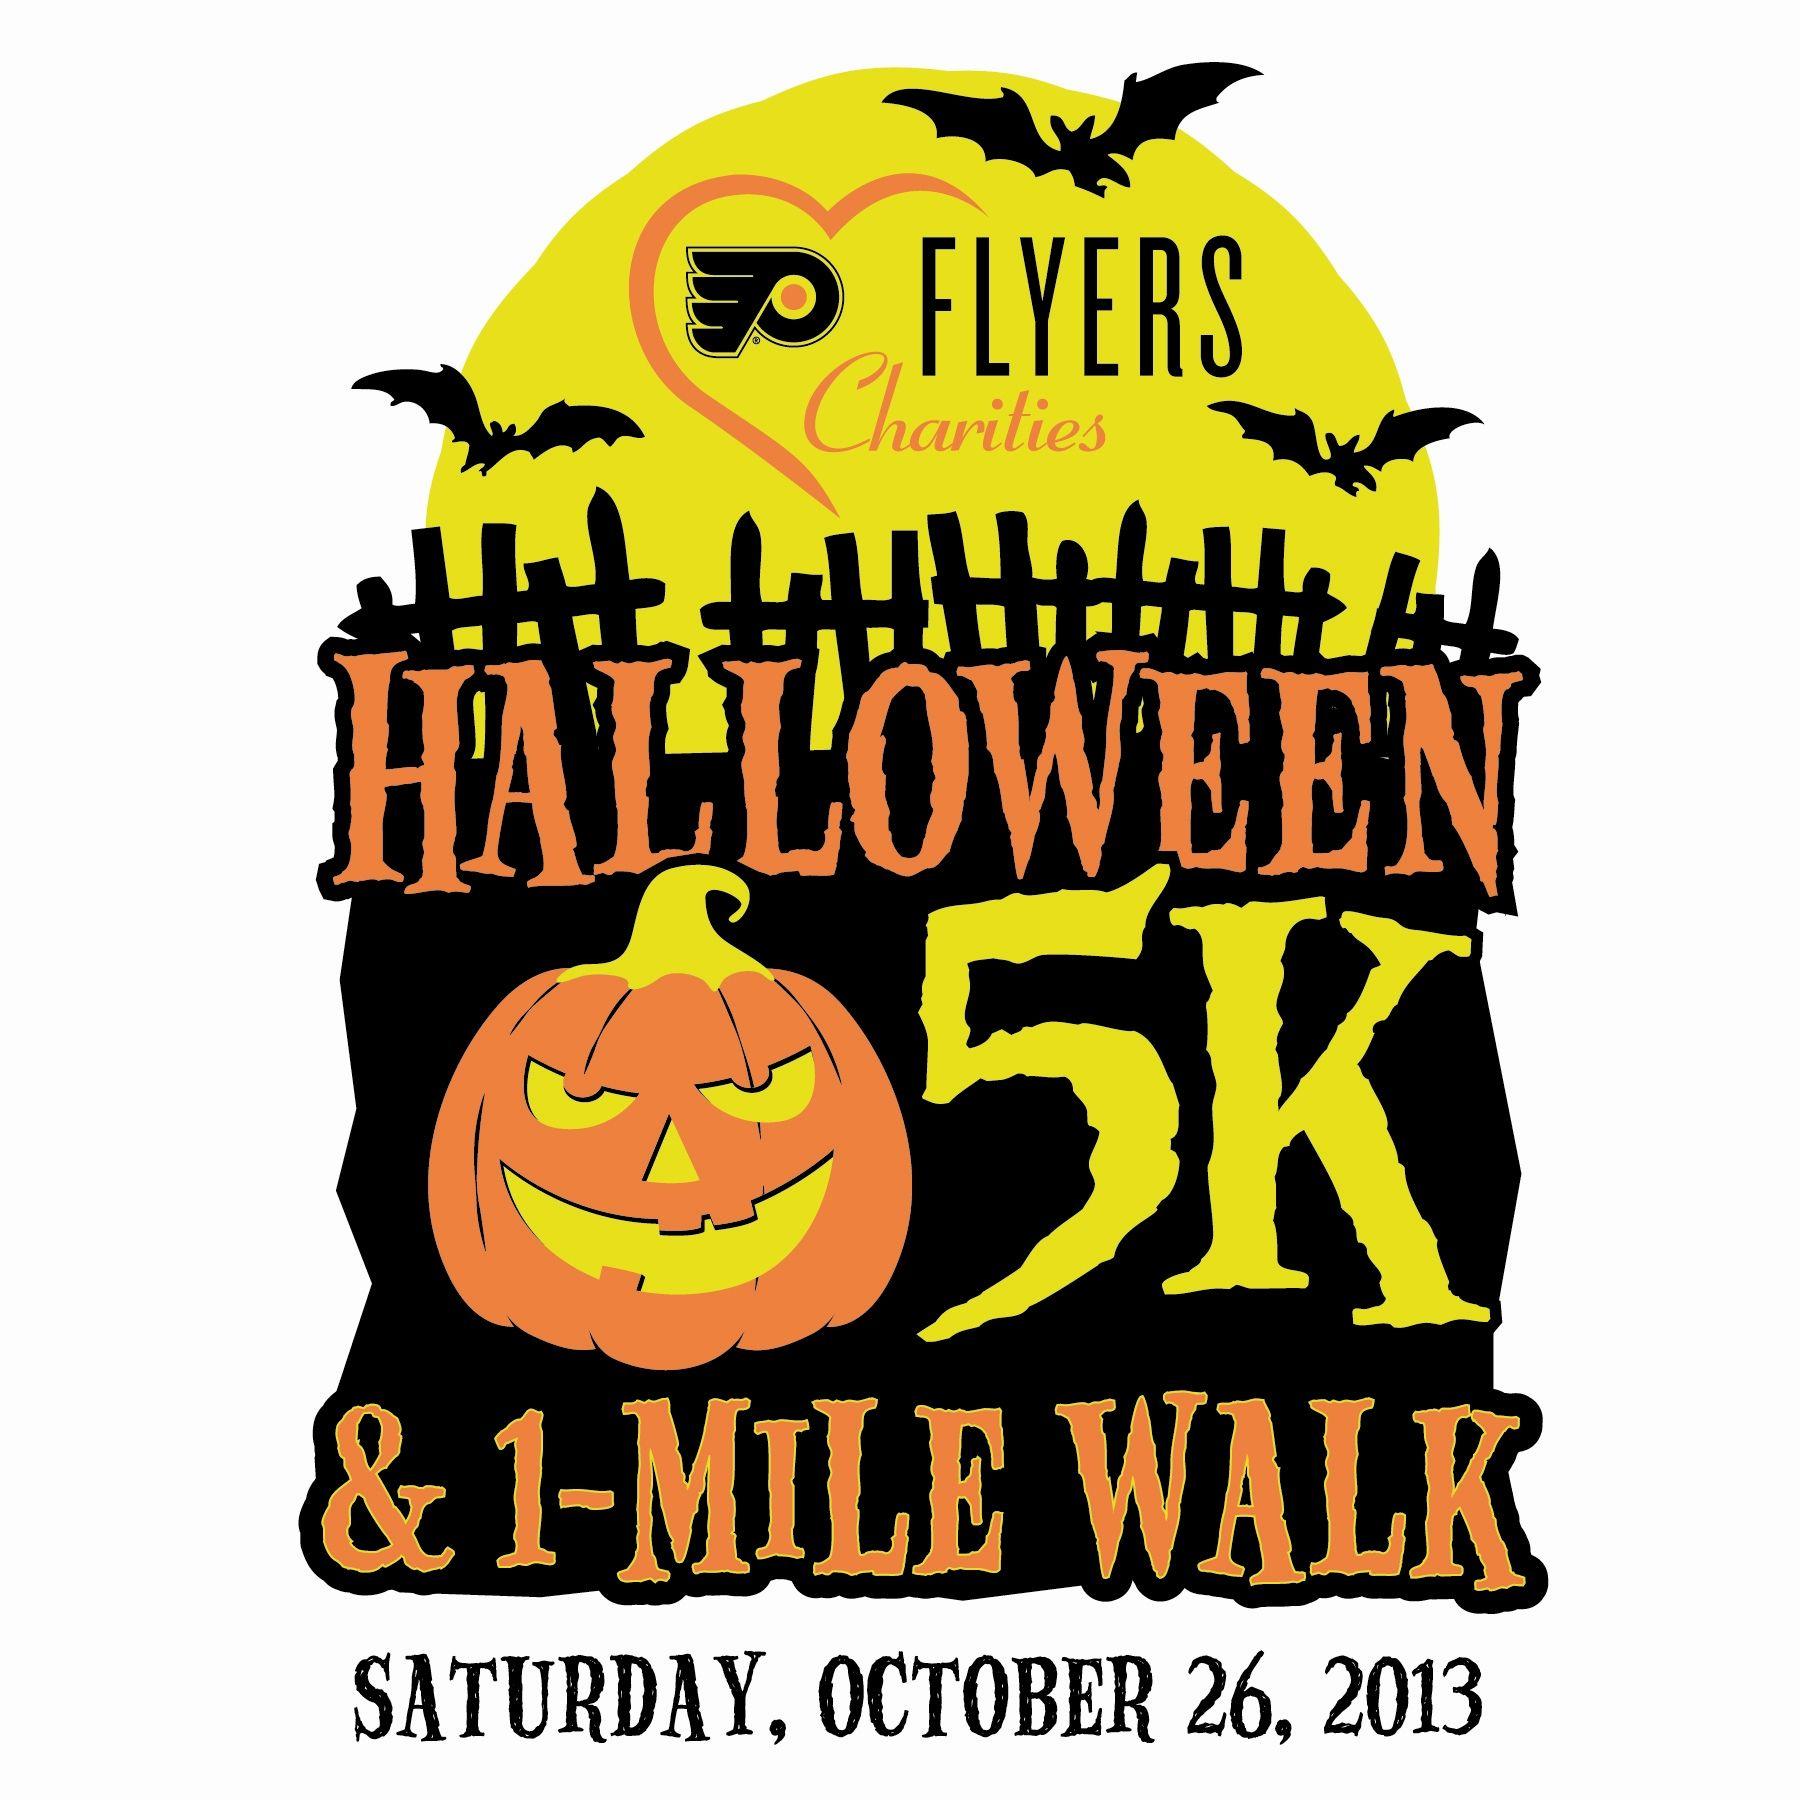 Philadelphia Flyers Halloween 5k Fall Charity Runs MyVSFallEdit